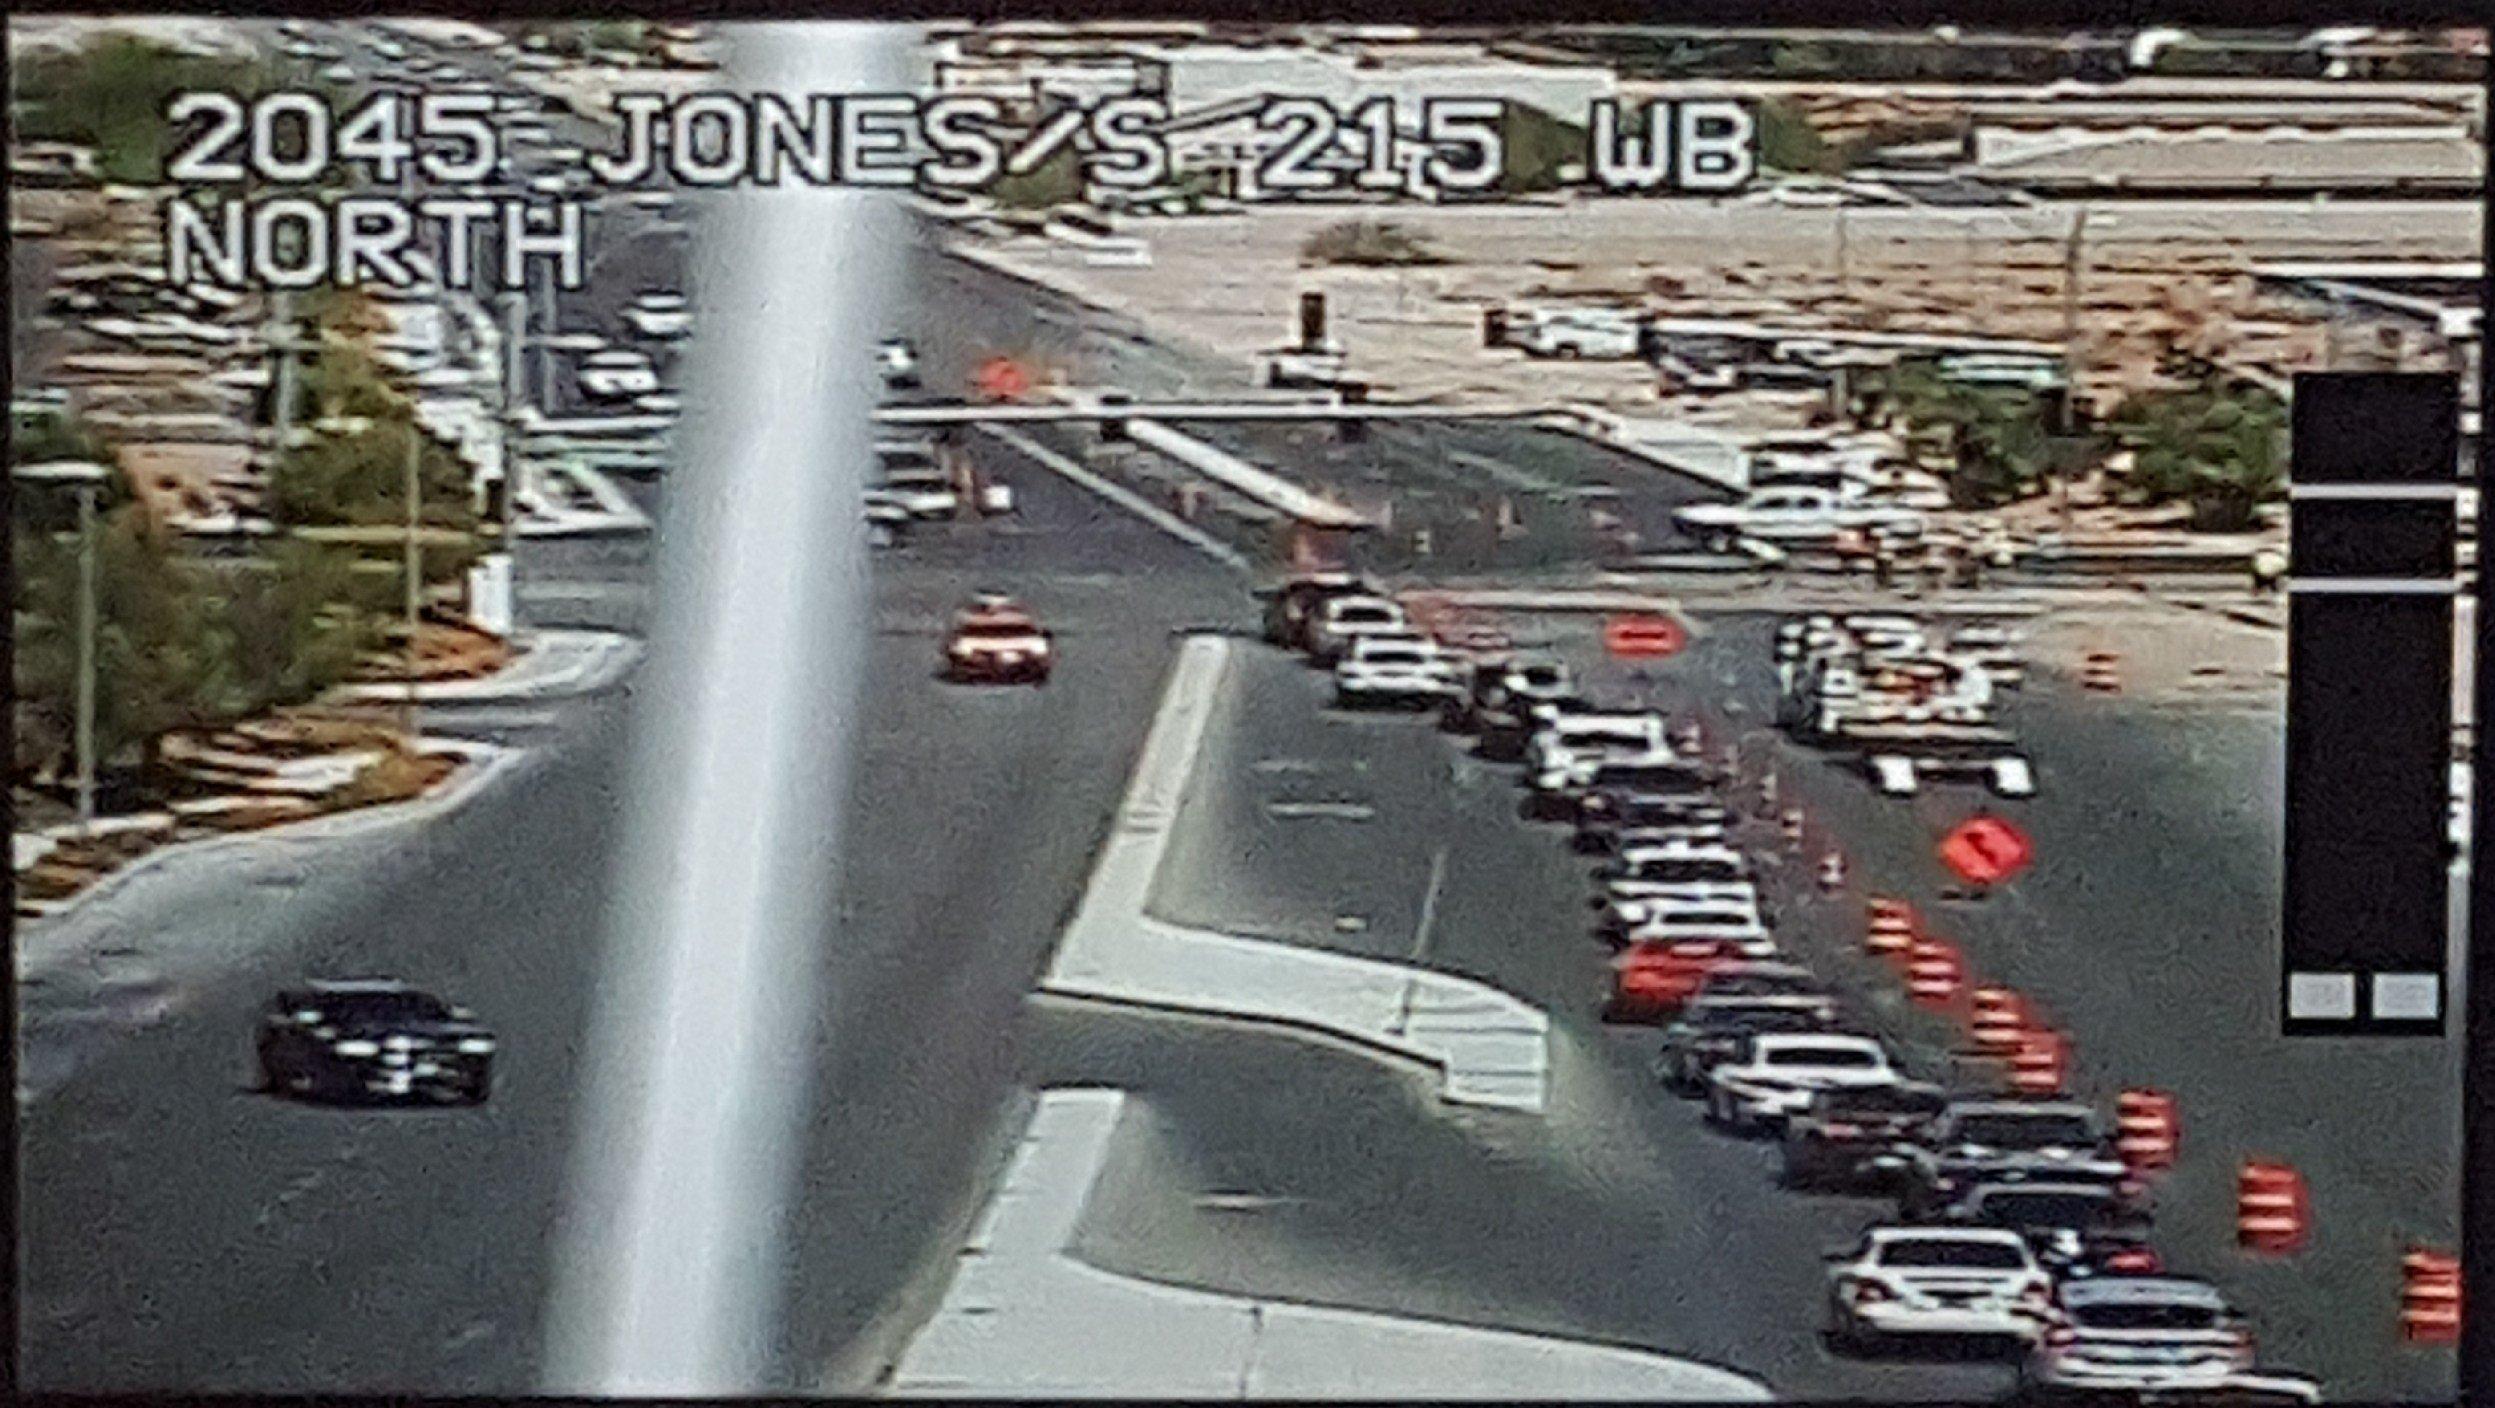 Gas leak closes lanes of Jones Blvd. at I-215 | Photo: LVACS